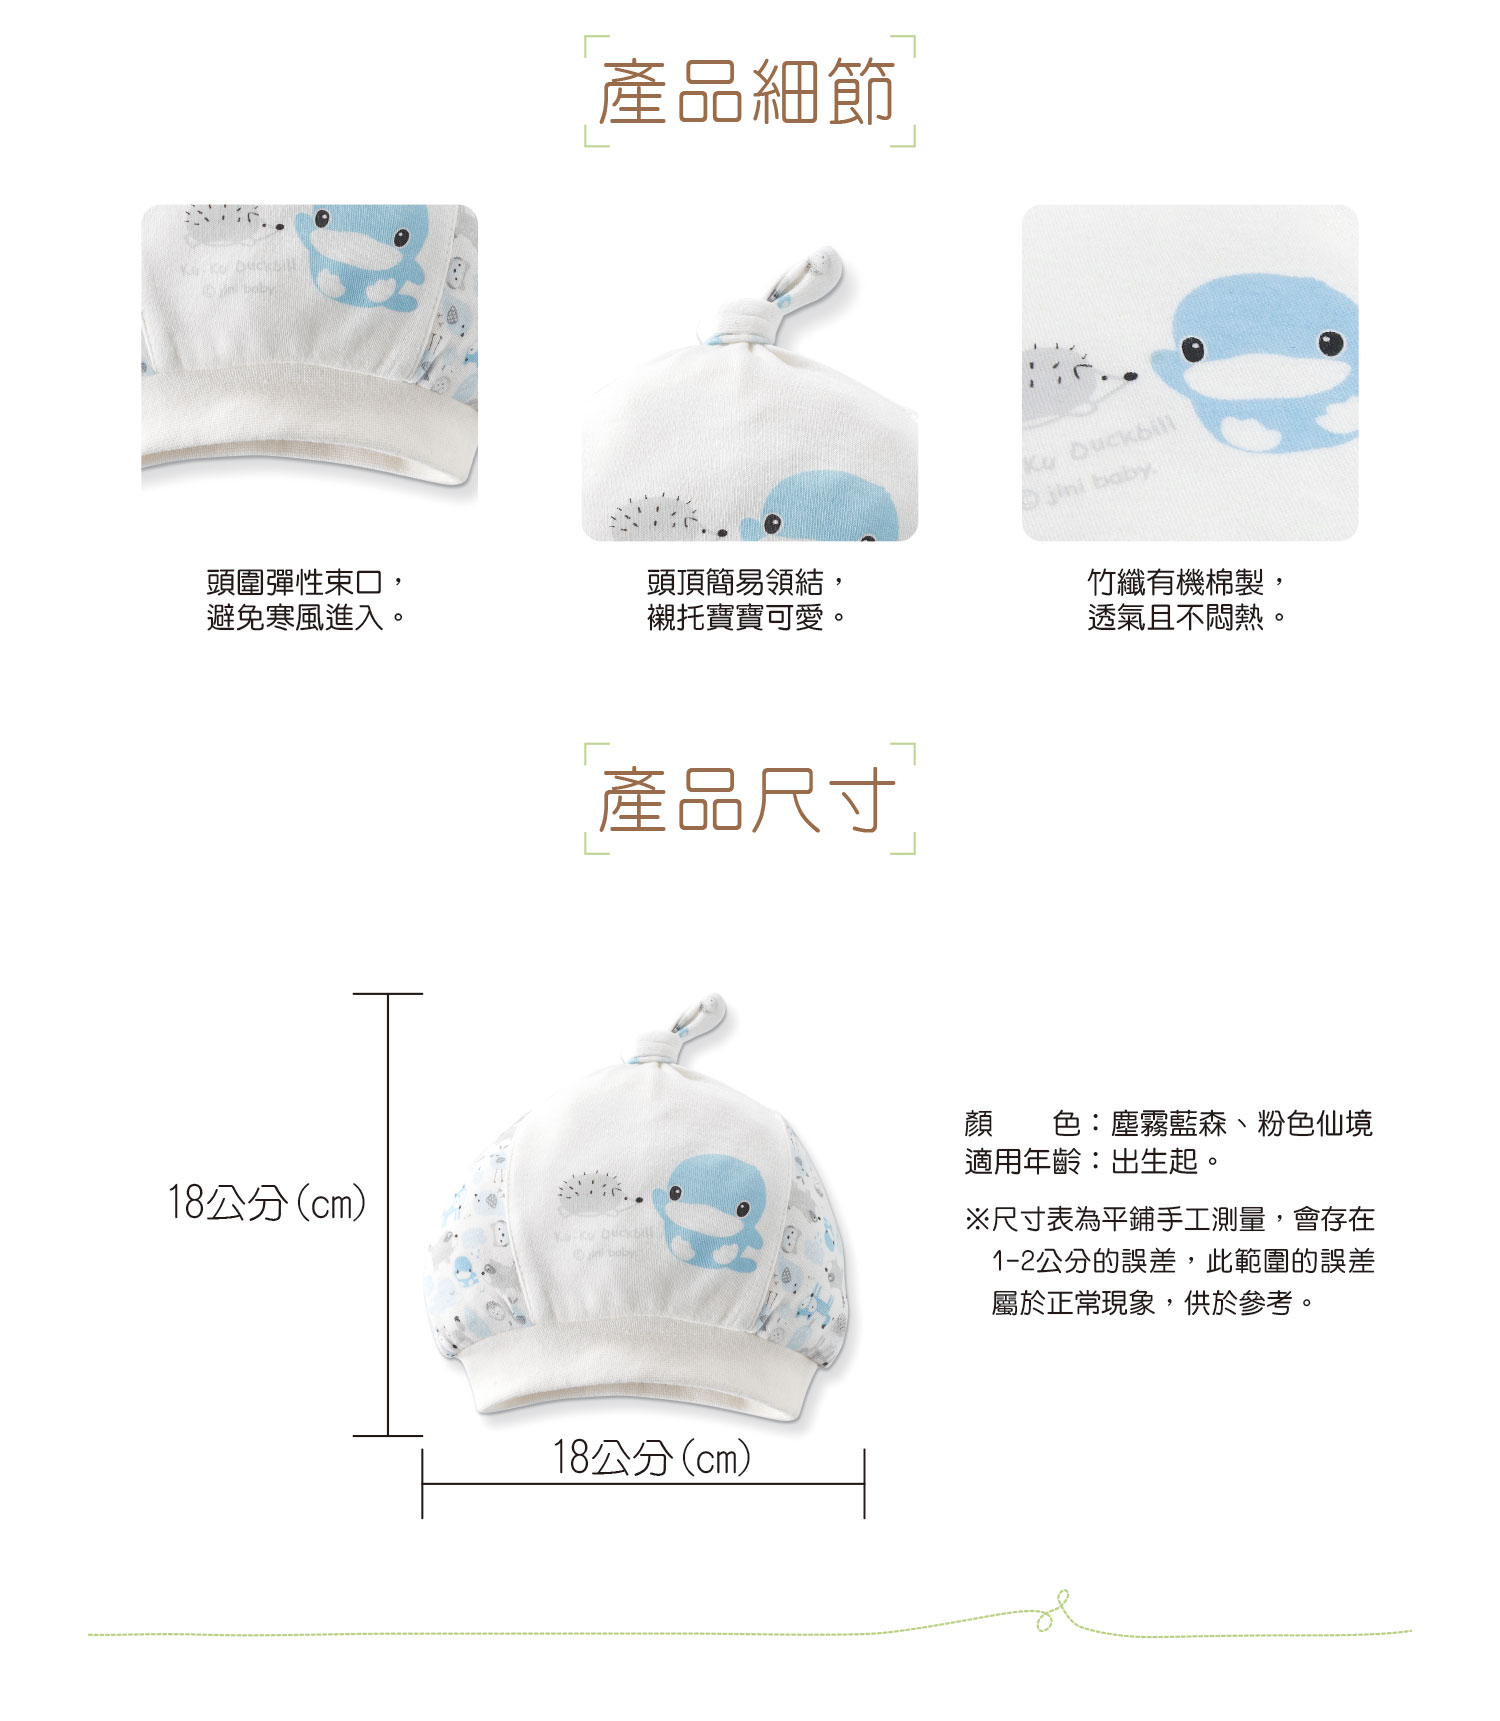 proimages/Cottons&BabyClothing/Organic_Bamboo/2530/2530_2.jpg